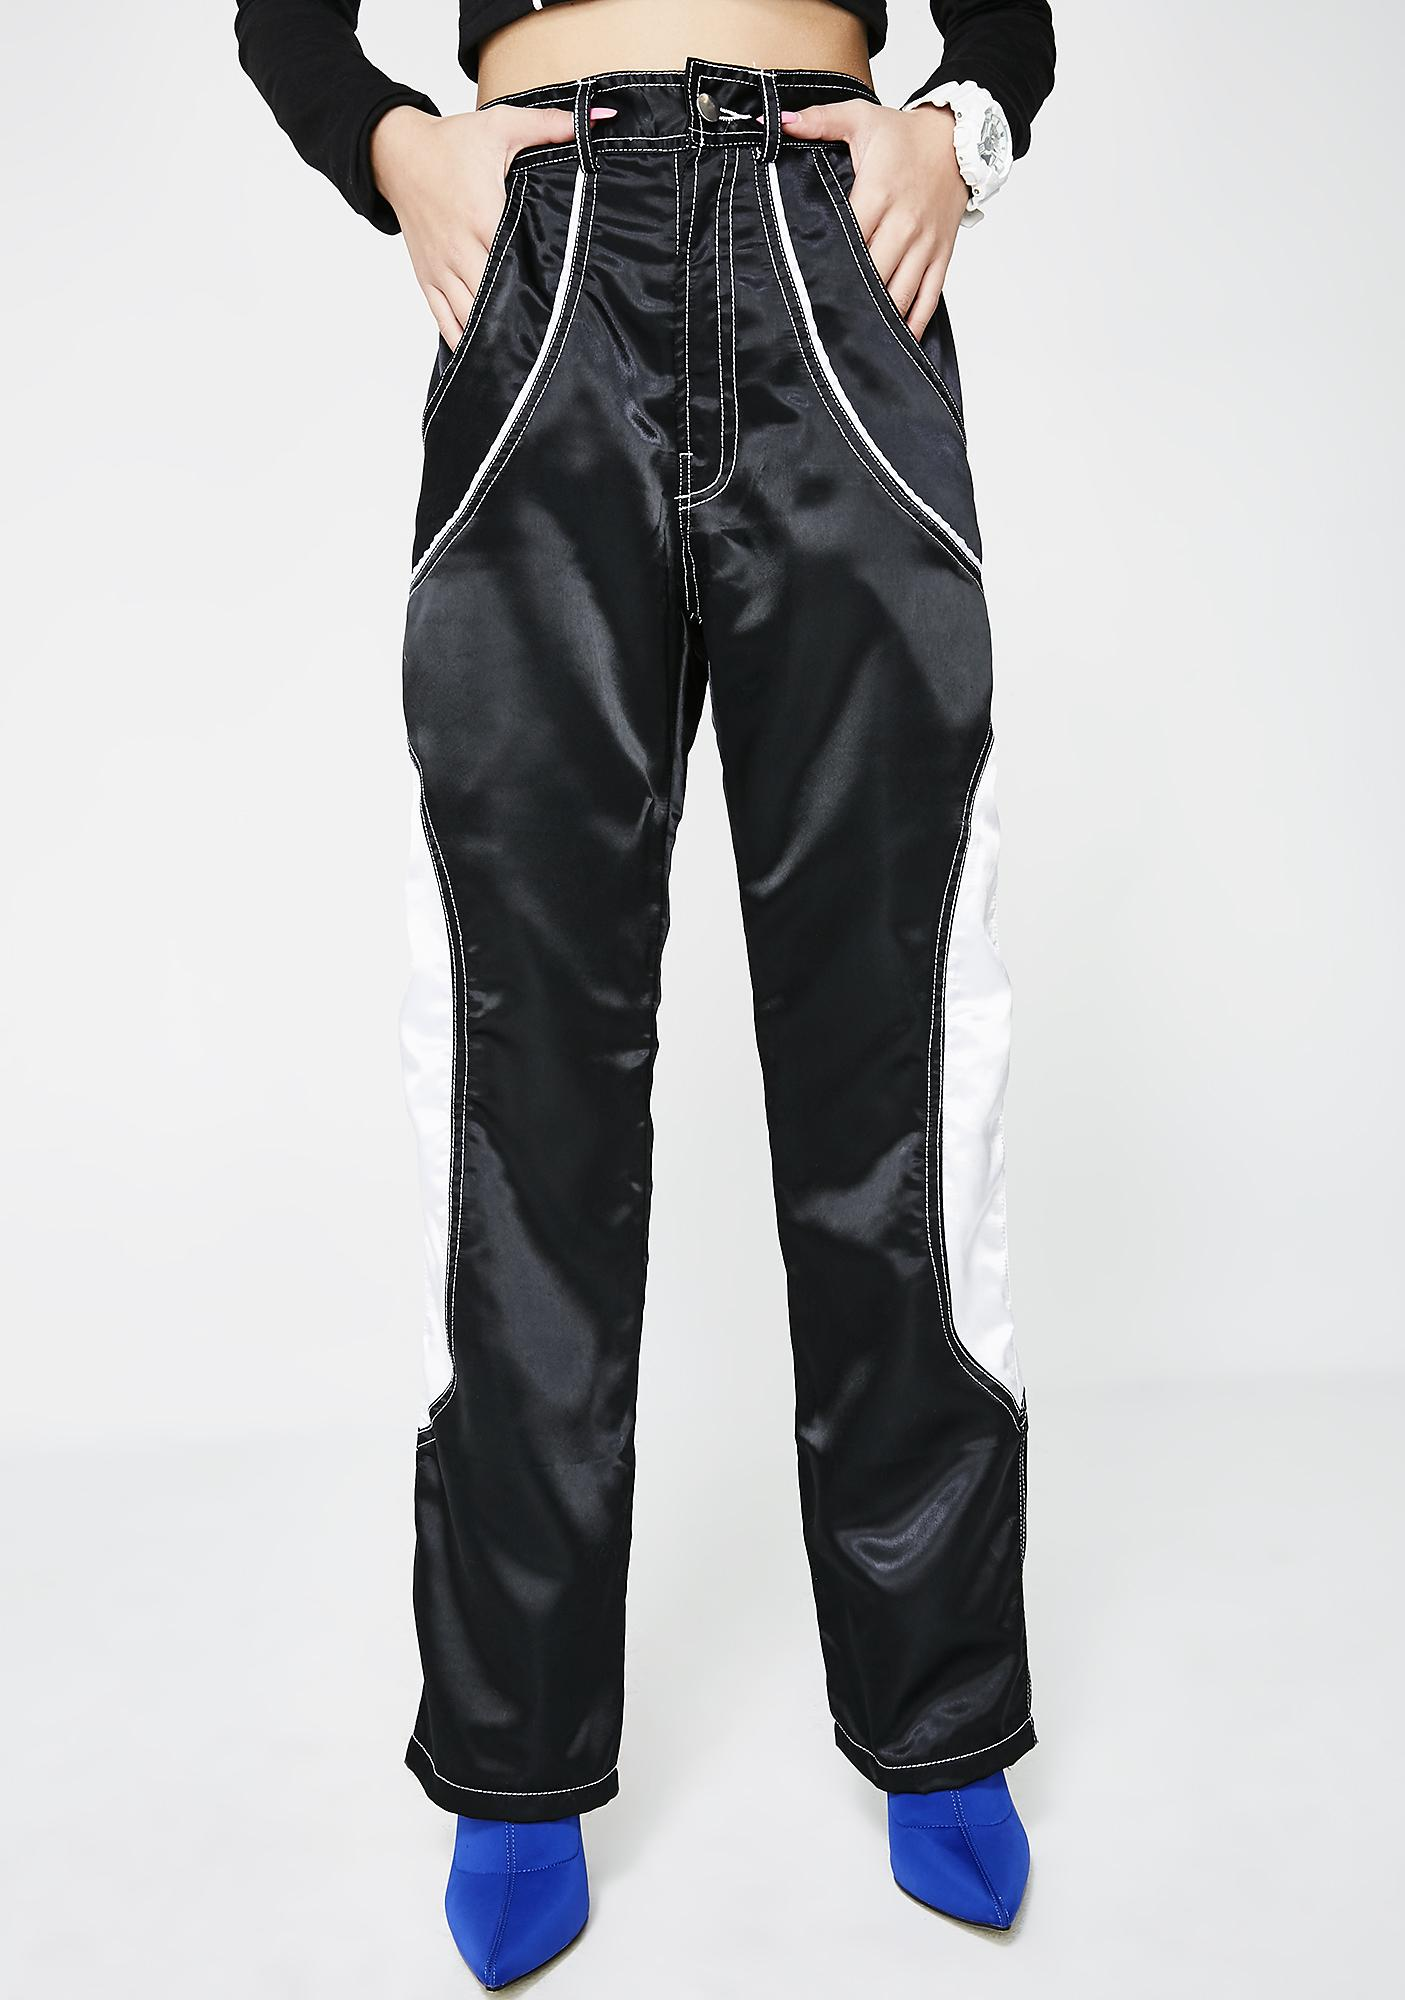 Sicko Cartel Black-White Satin Pants